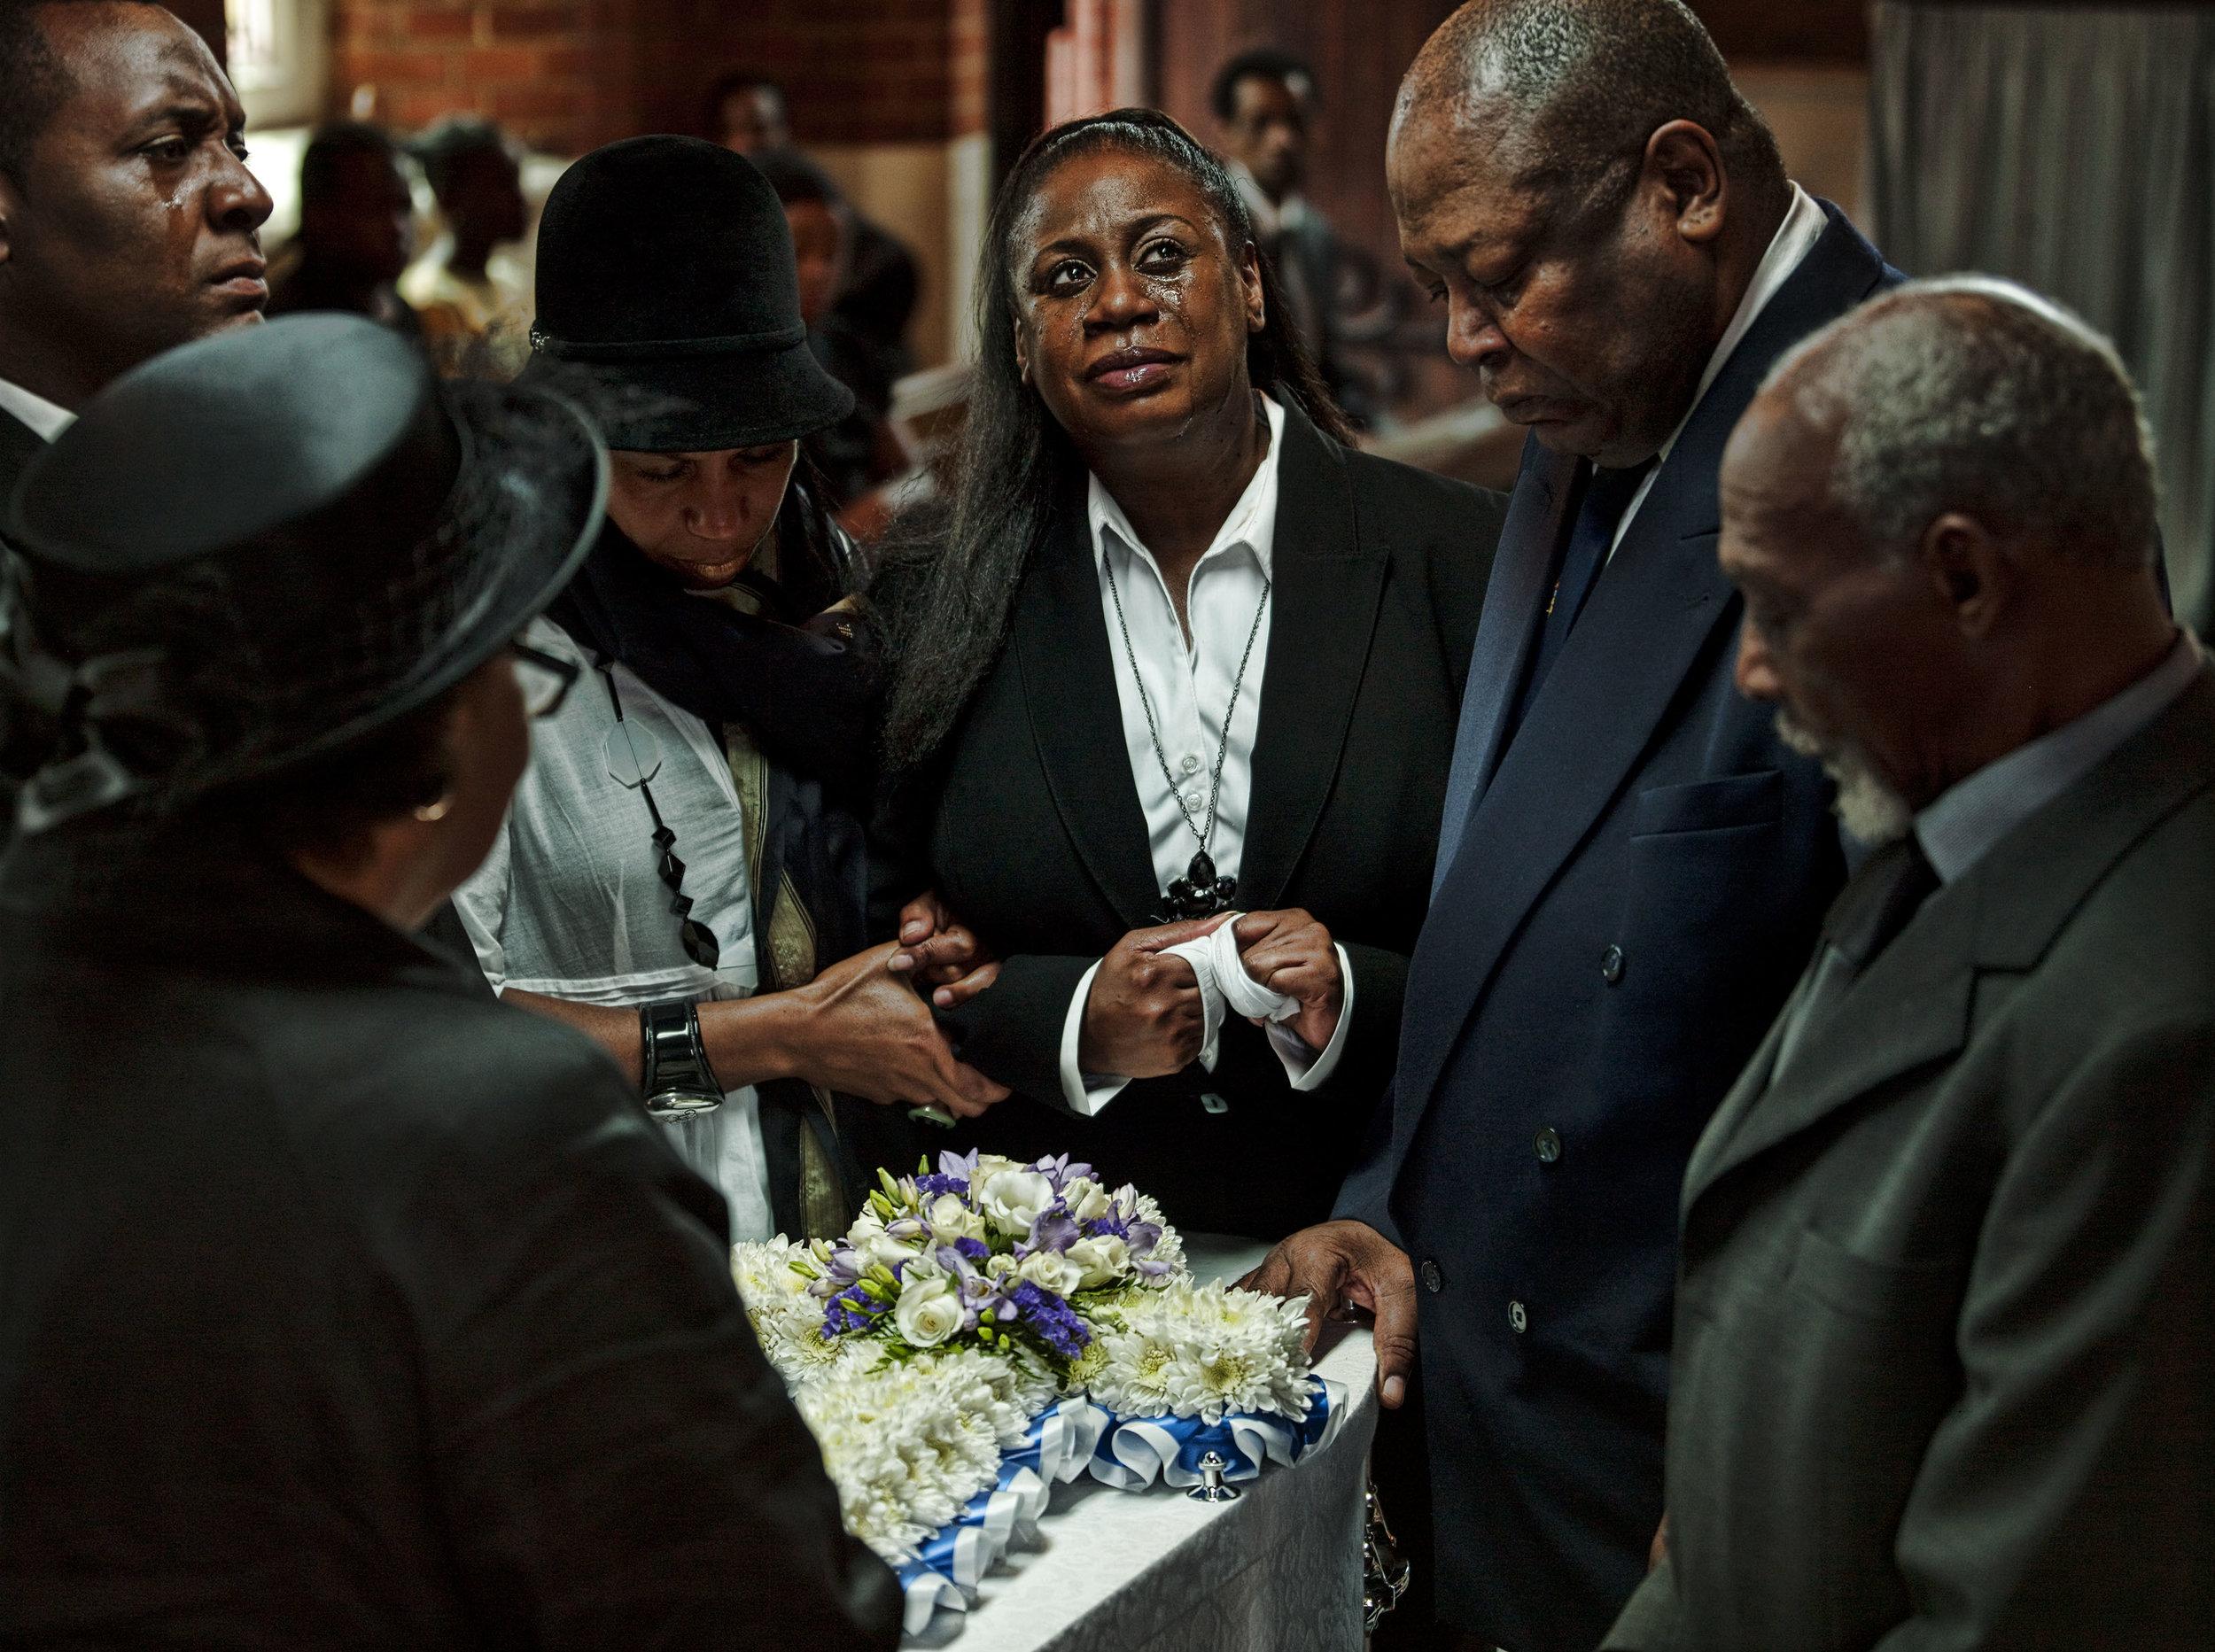 Funeral Shot by John Ferguson